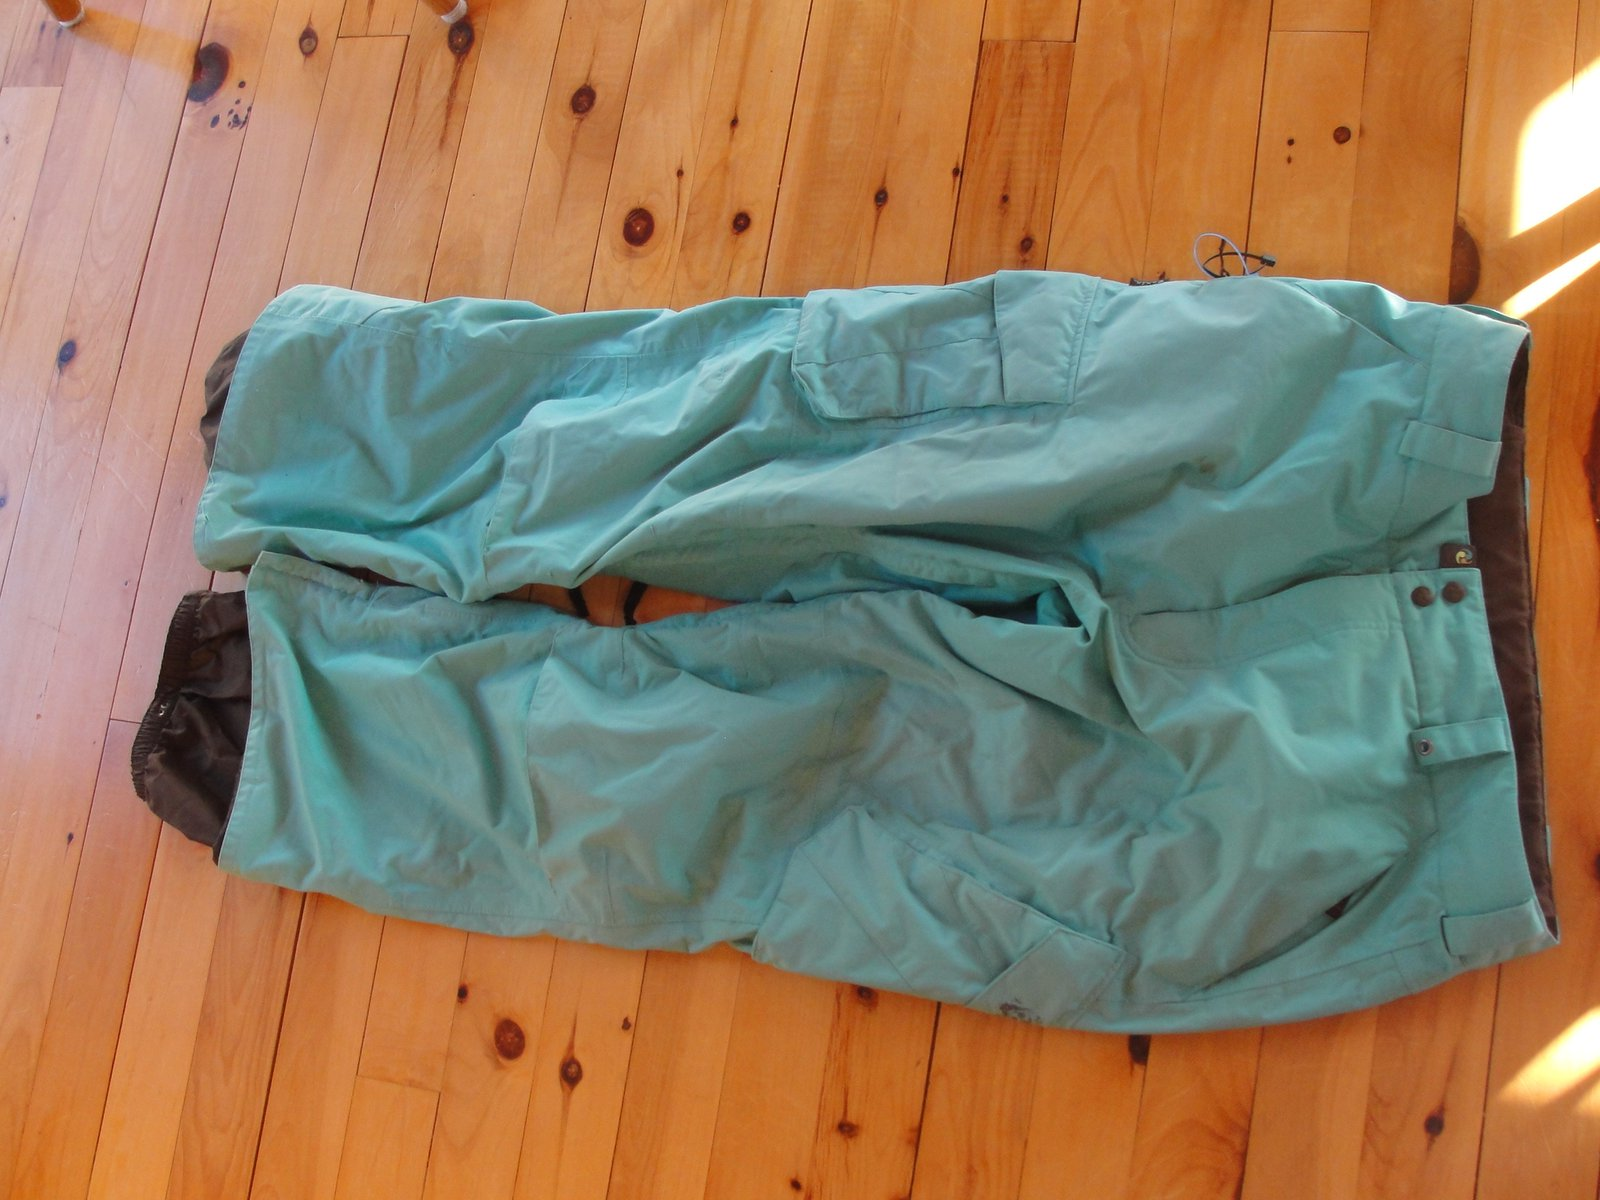 Ronin La Cosa Nostra Pants For Sale